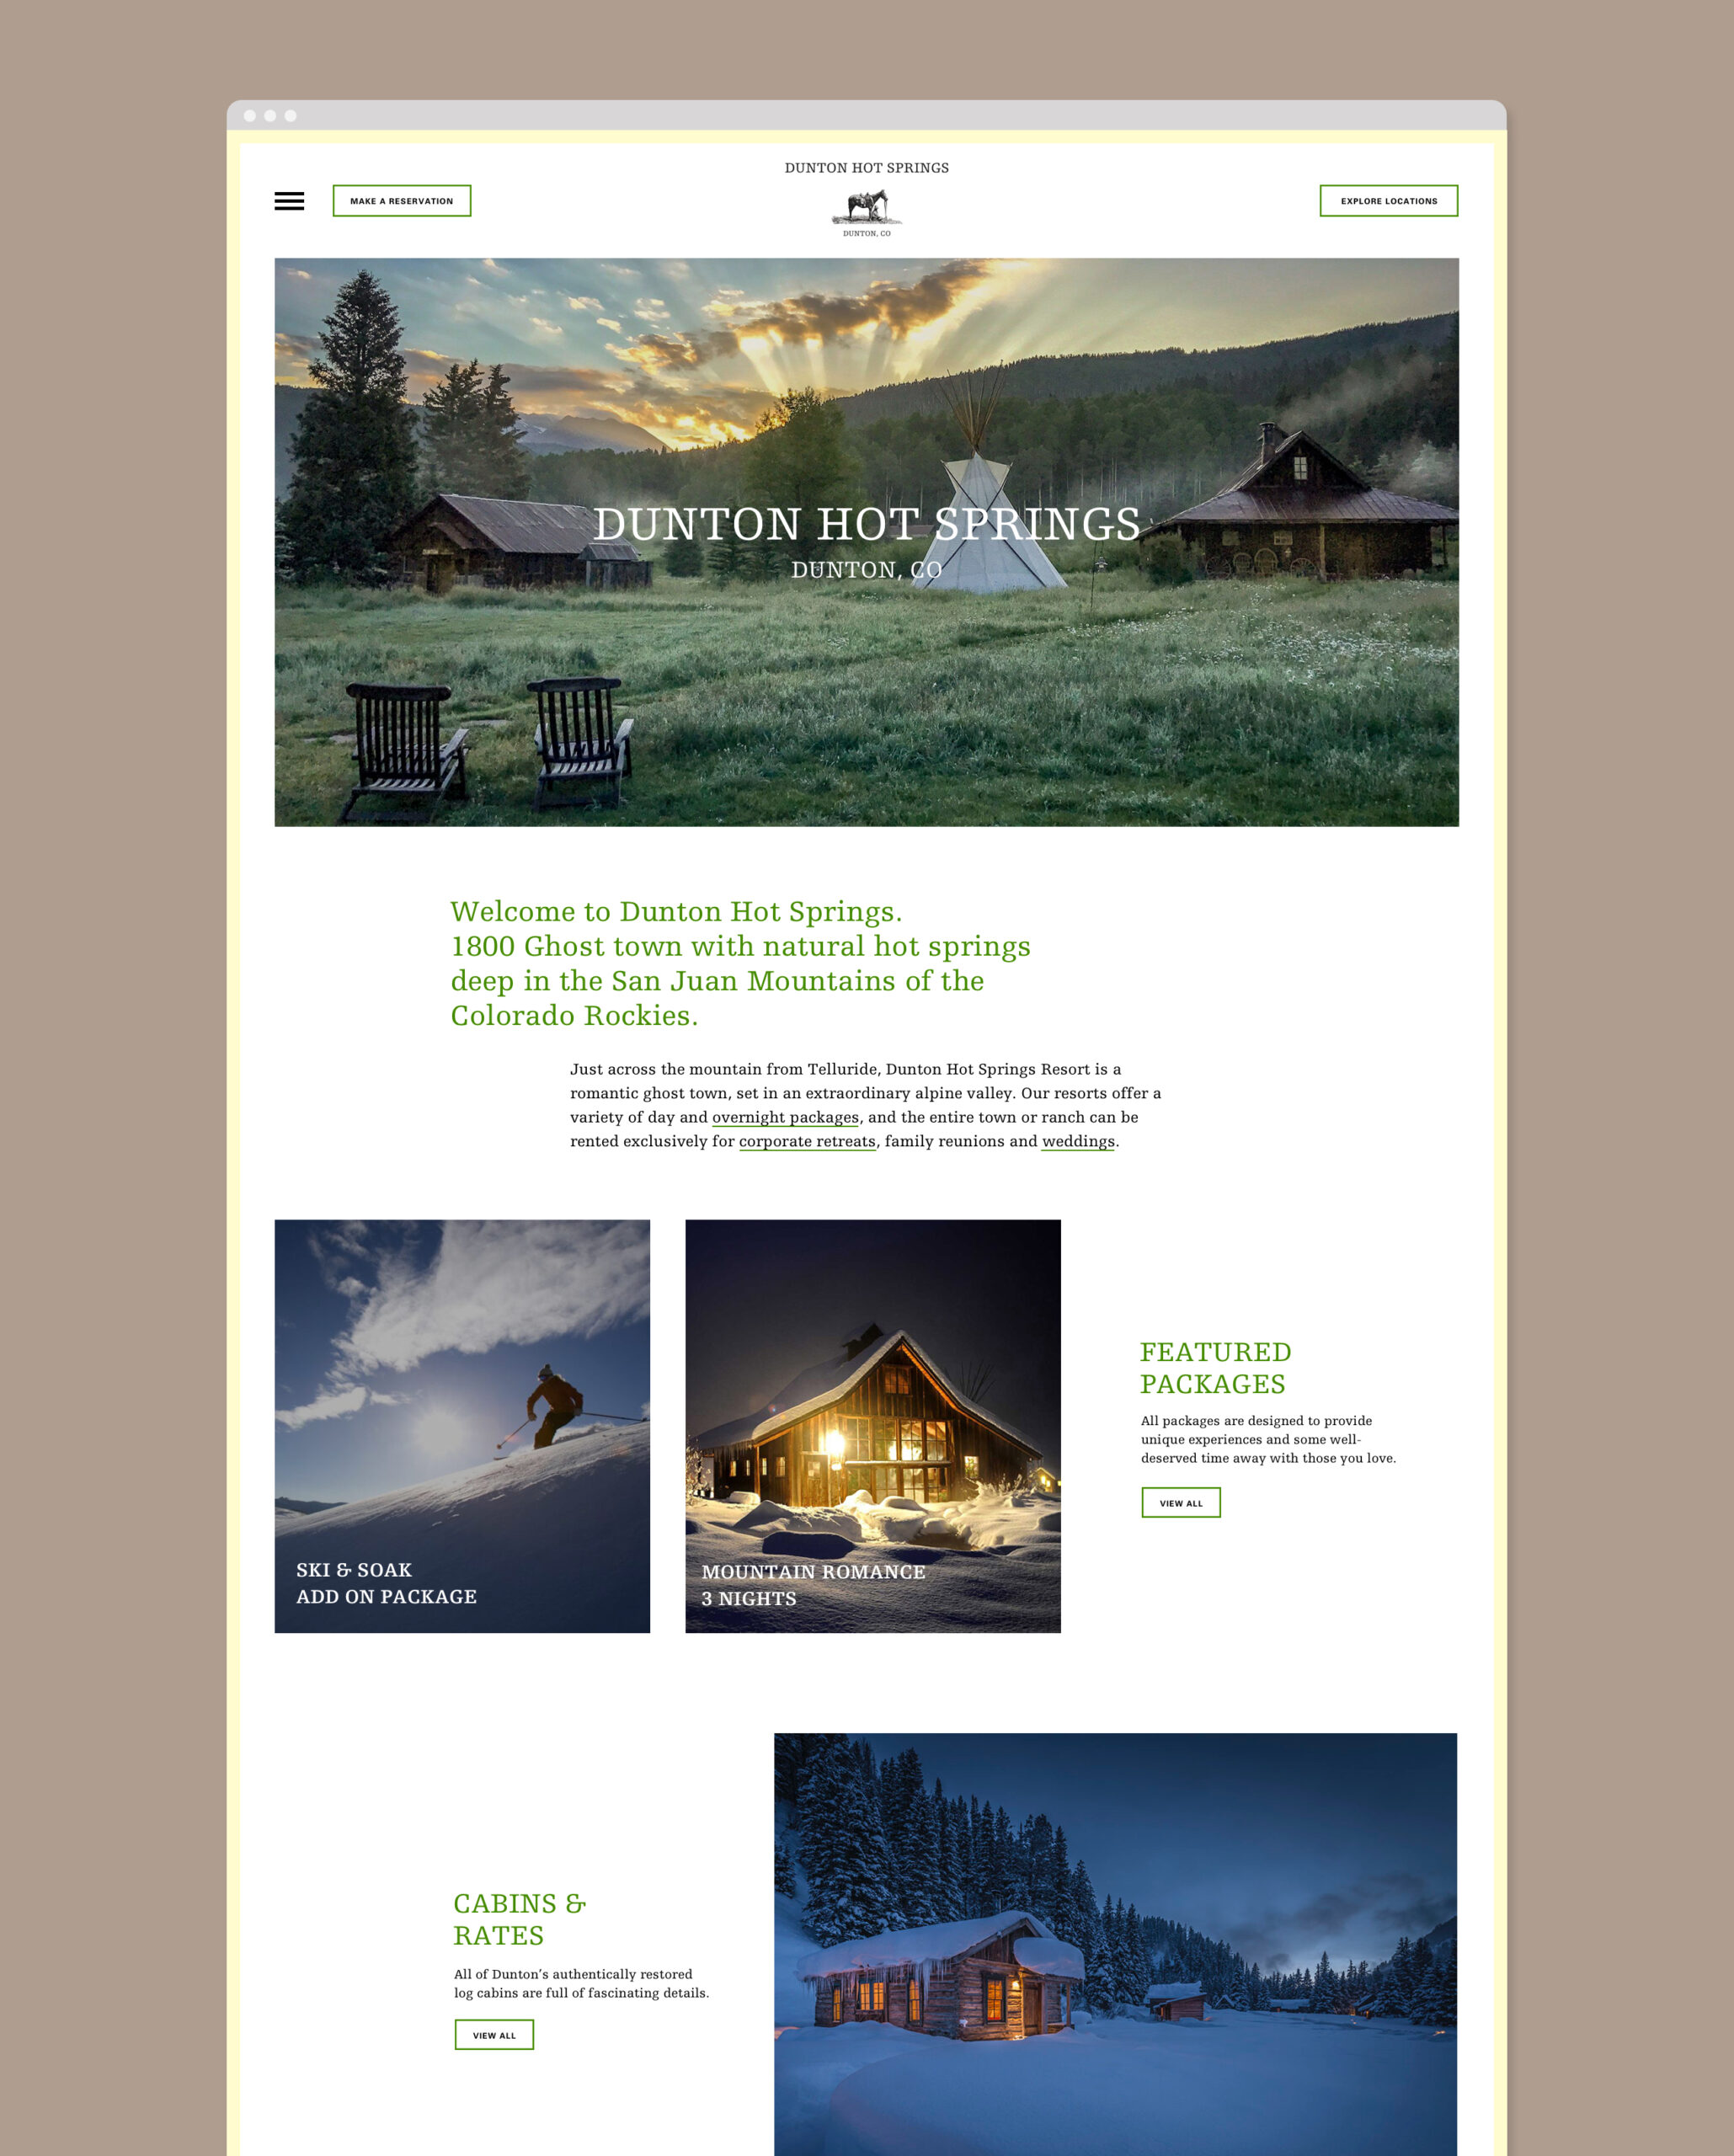 Dunton Hot Springs website design mockup